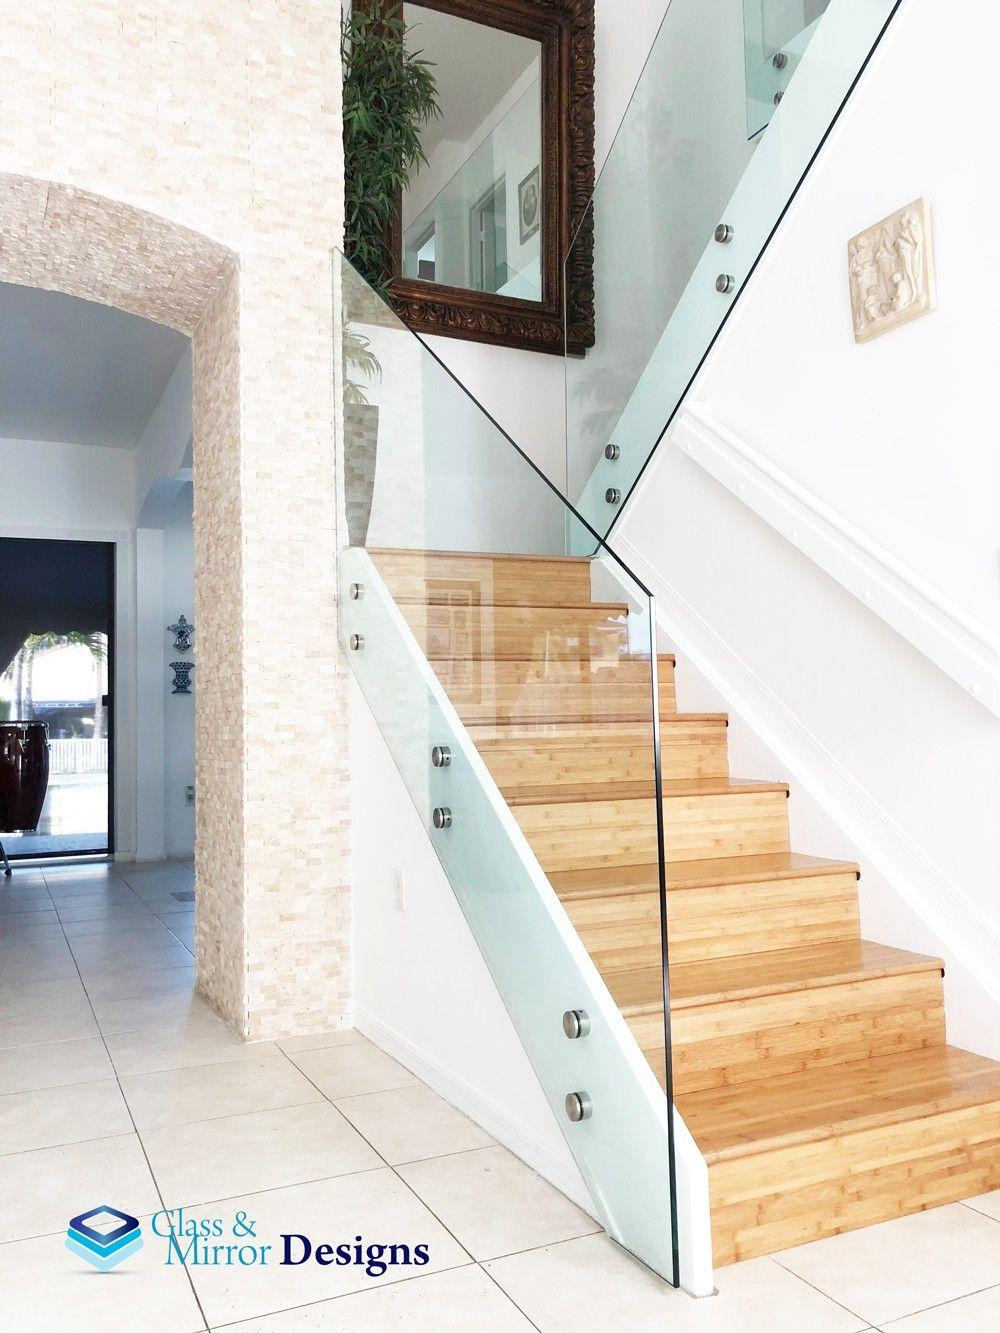 Glass Staircase | Staircase design, Glass staircase ...